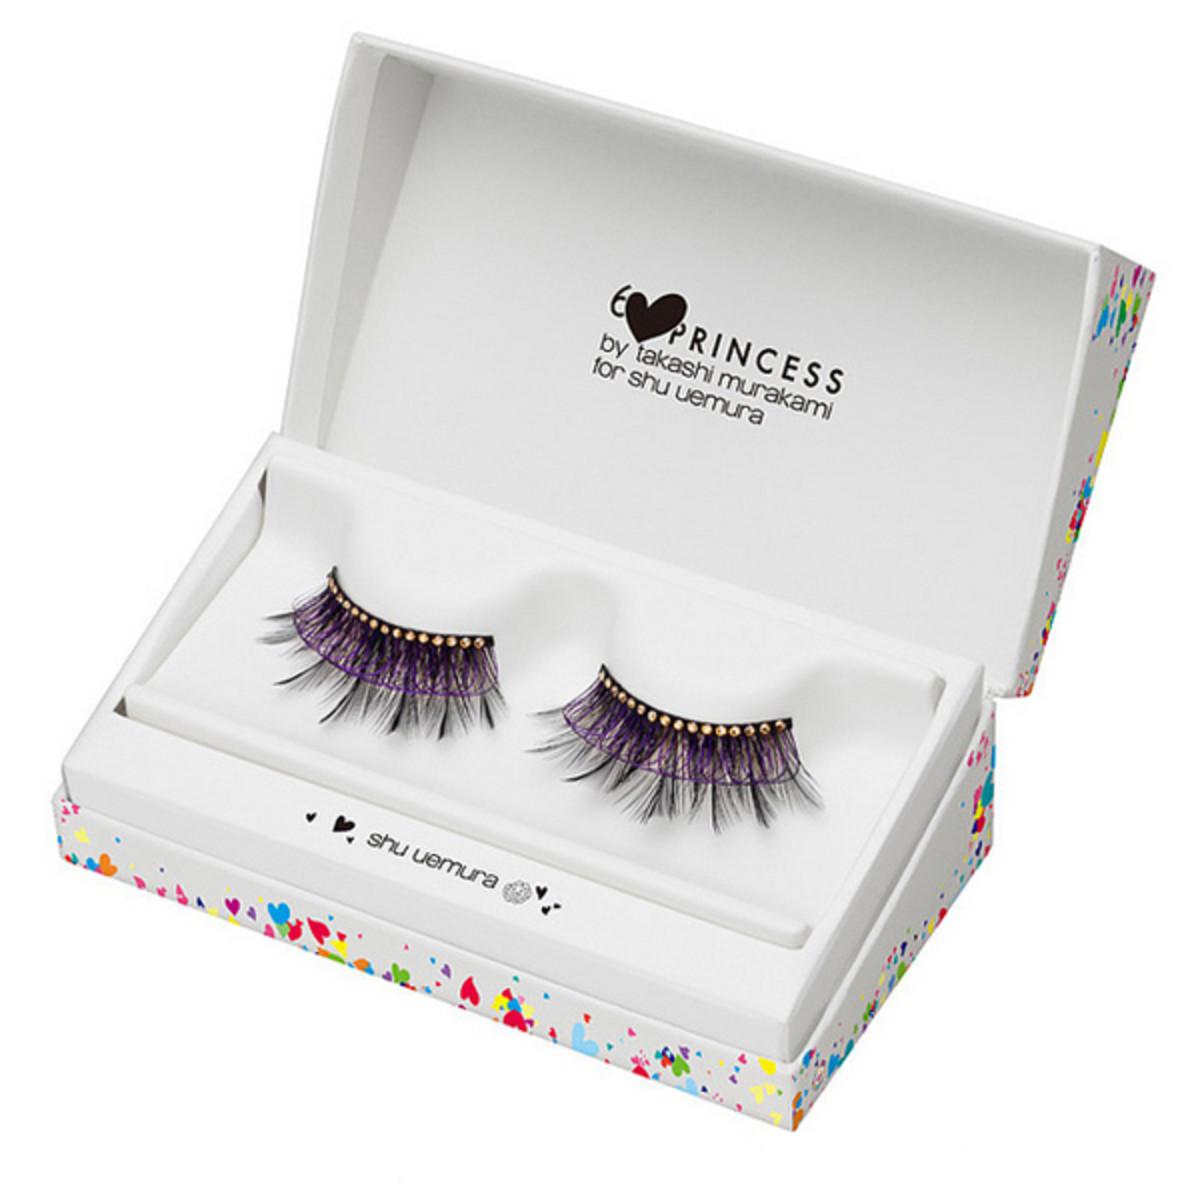 Shu Uemura 6Princess Takashi Murakami for Shu Uemura Black Jewel on Wing False Eyelash Premium Edition